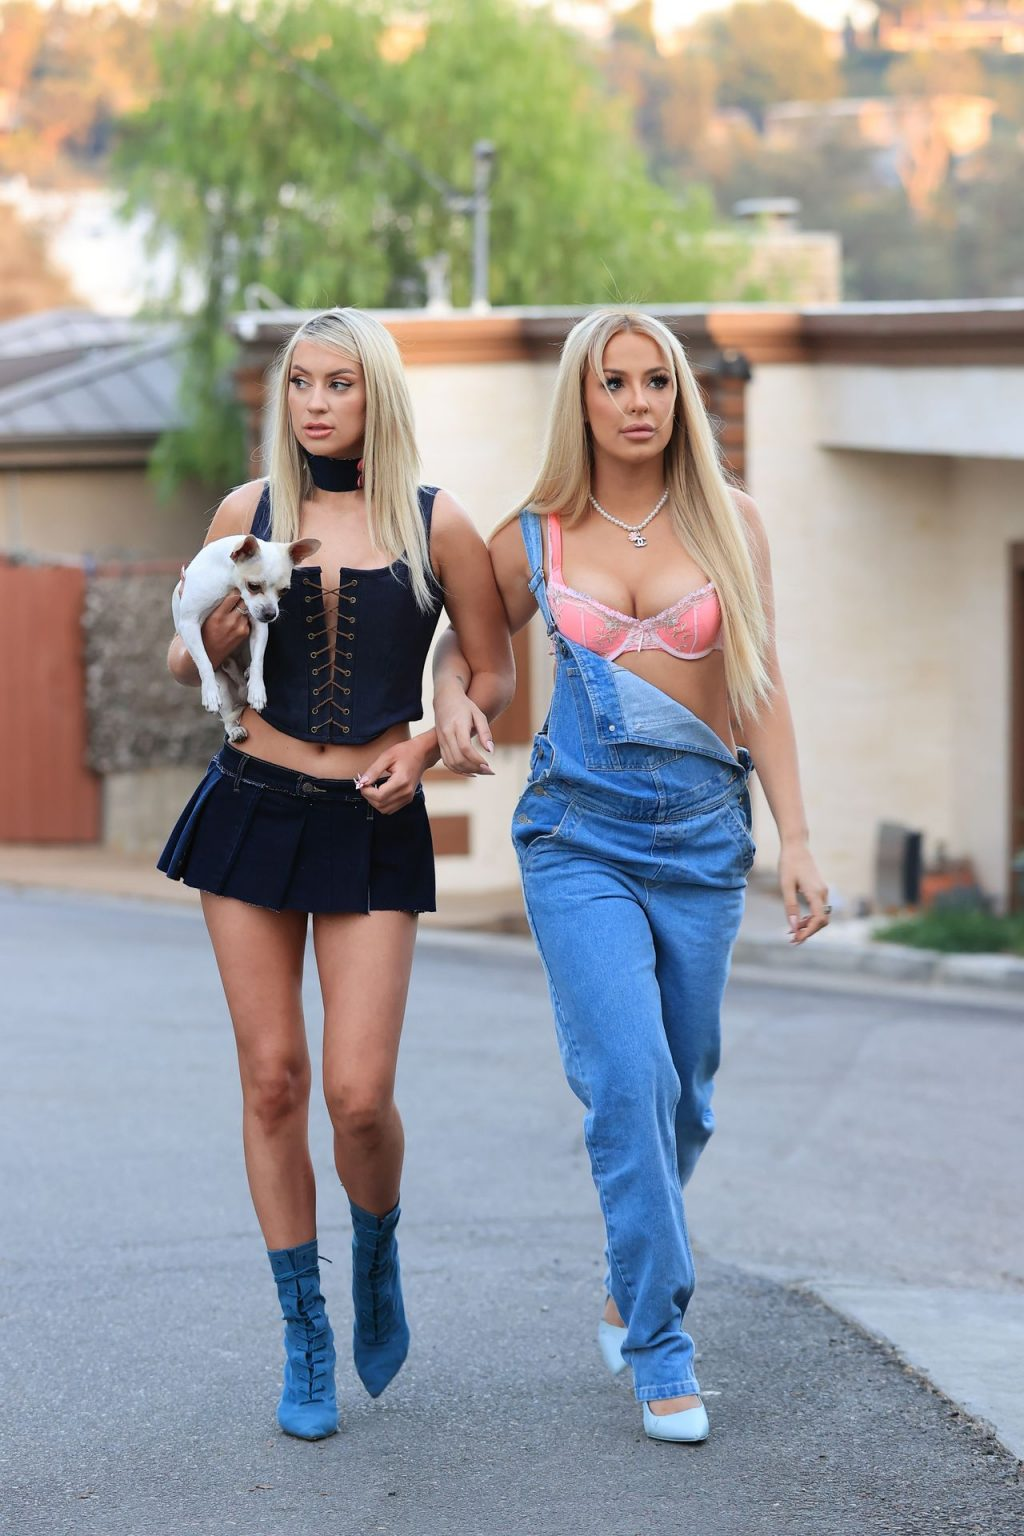 Tana Mongeau & Ashley Schwan Dress Up Like Paris and Nicole from The Simple Life for Halloween (25 Photos)